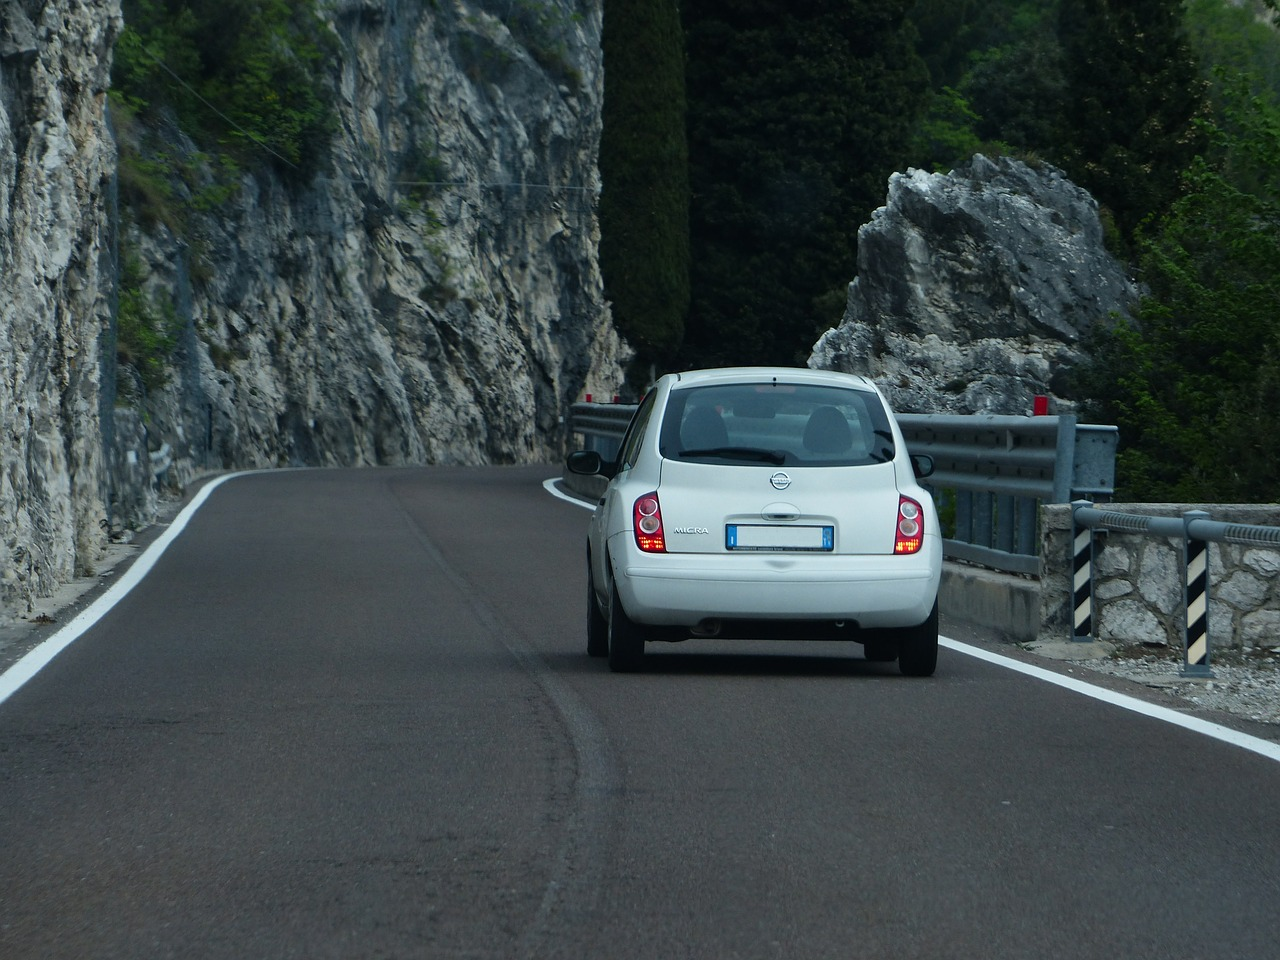 road-367536_1280